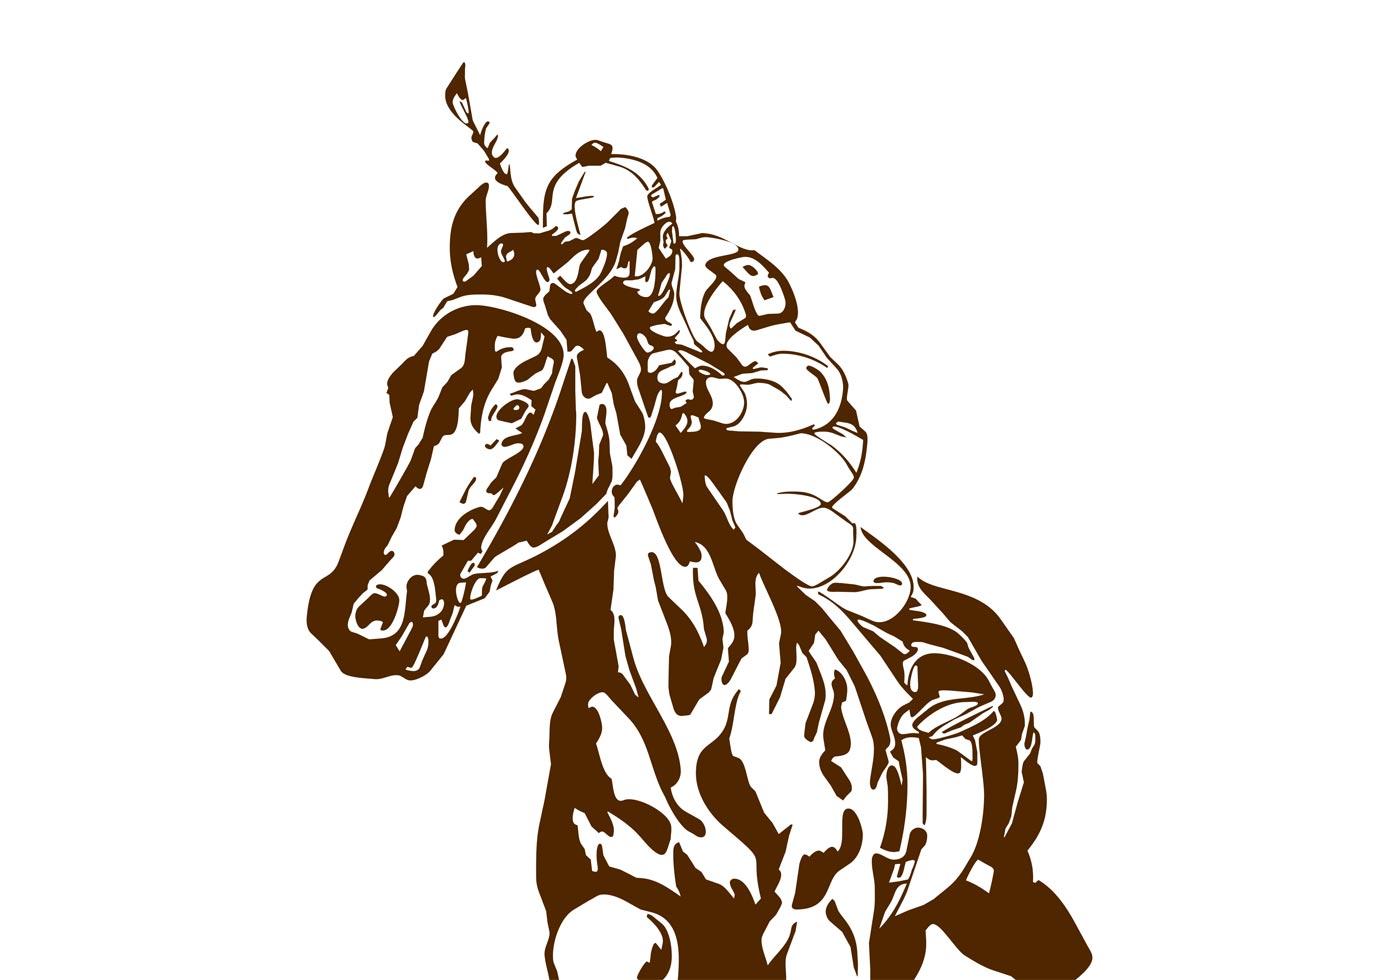 Jockey On Horse Download Free Vector Art Stock Graphics